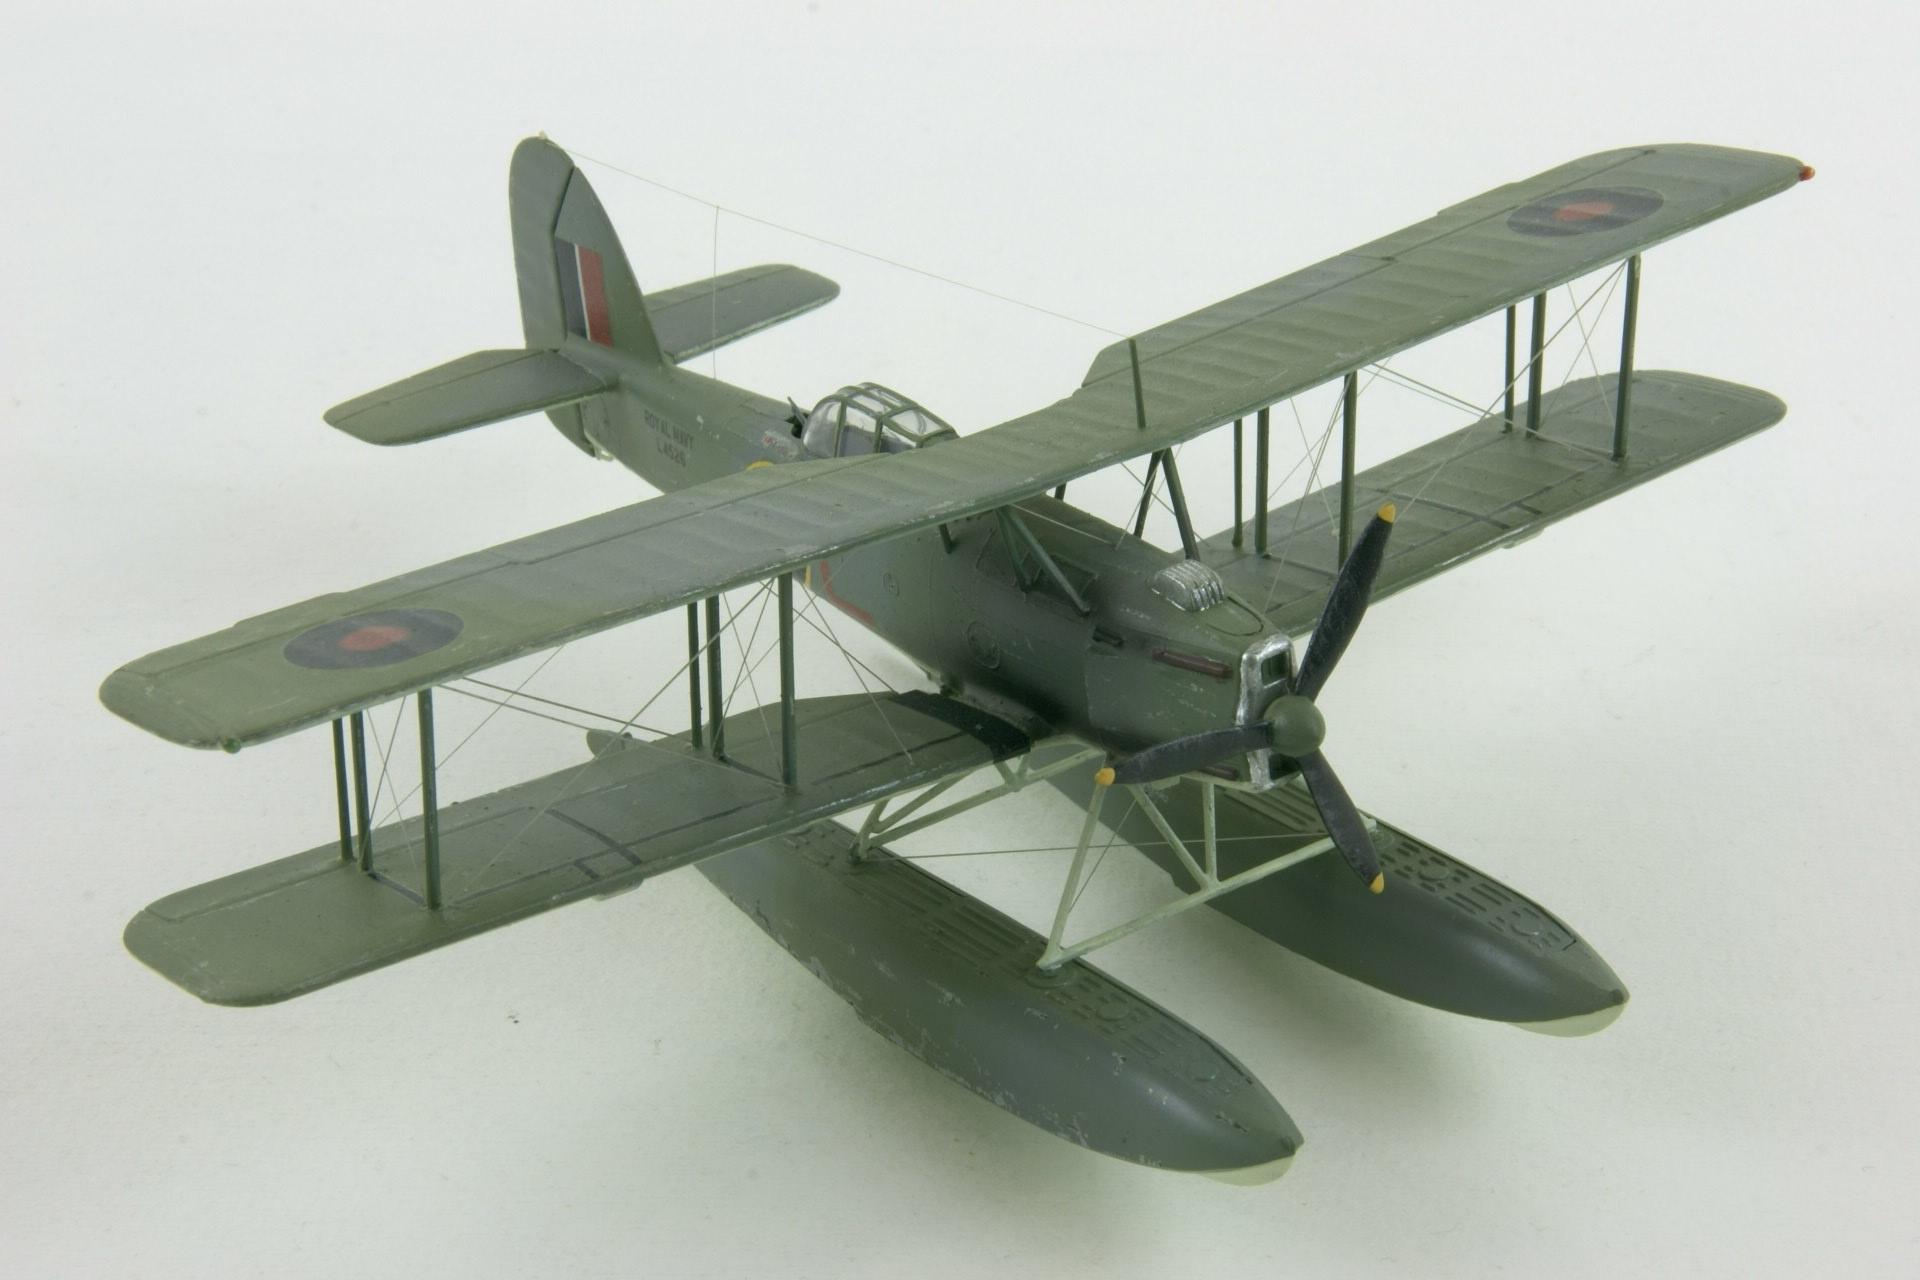 Fairey seafox 4 1